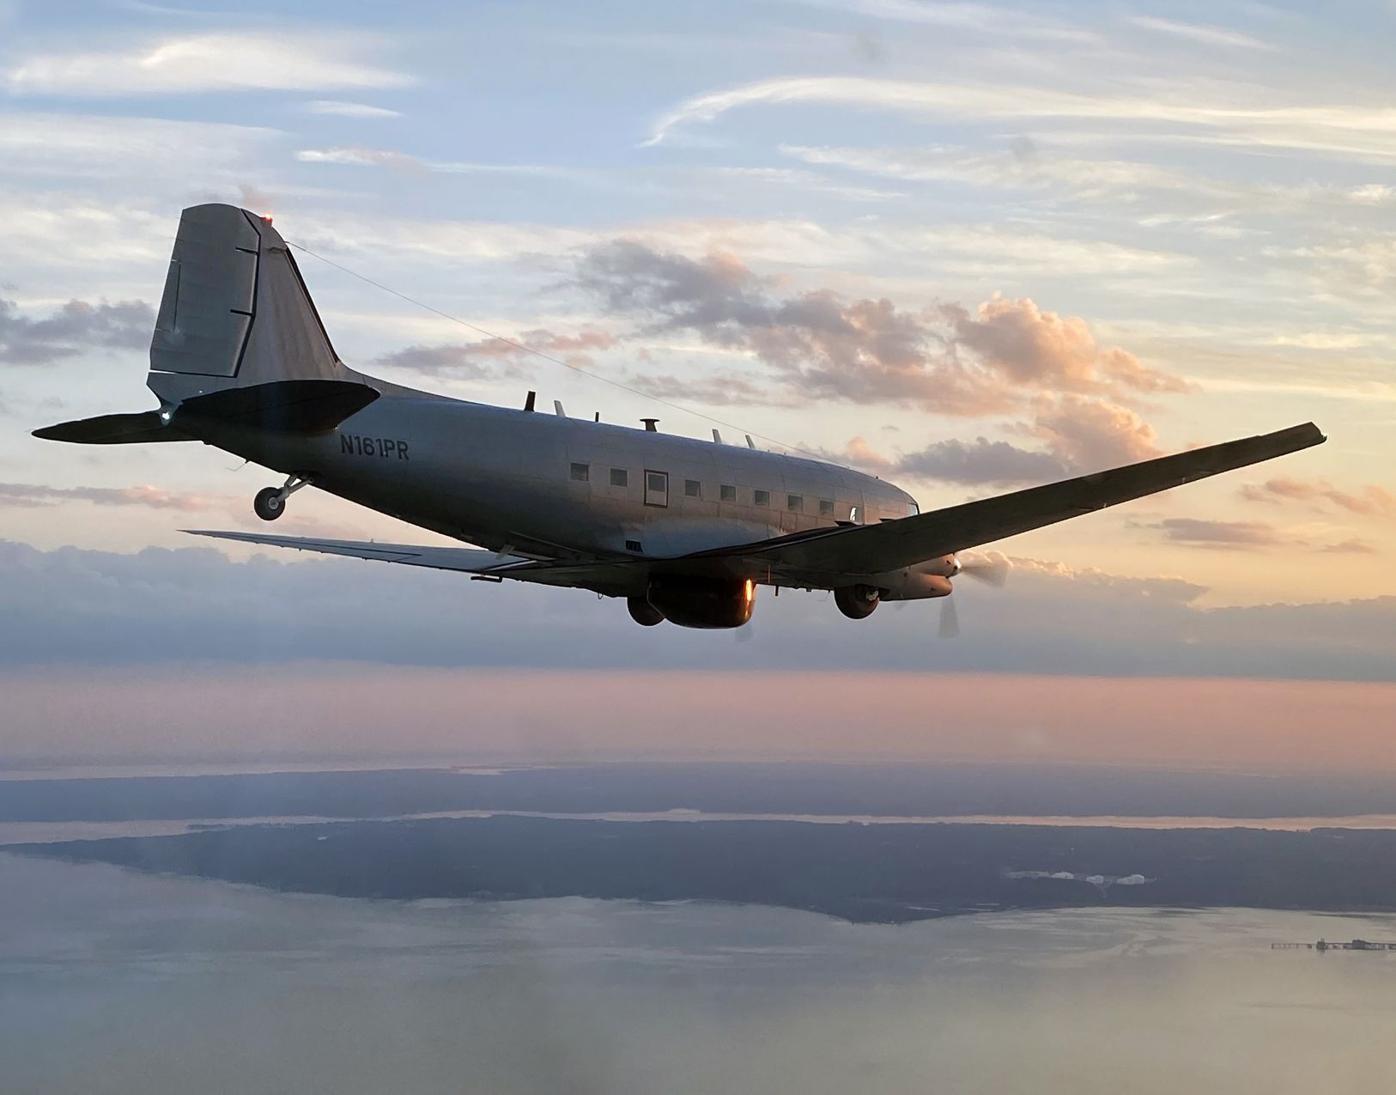 WW II aircraft flies again for NAWCAD